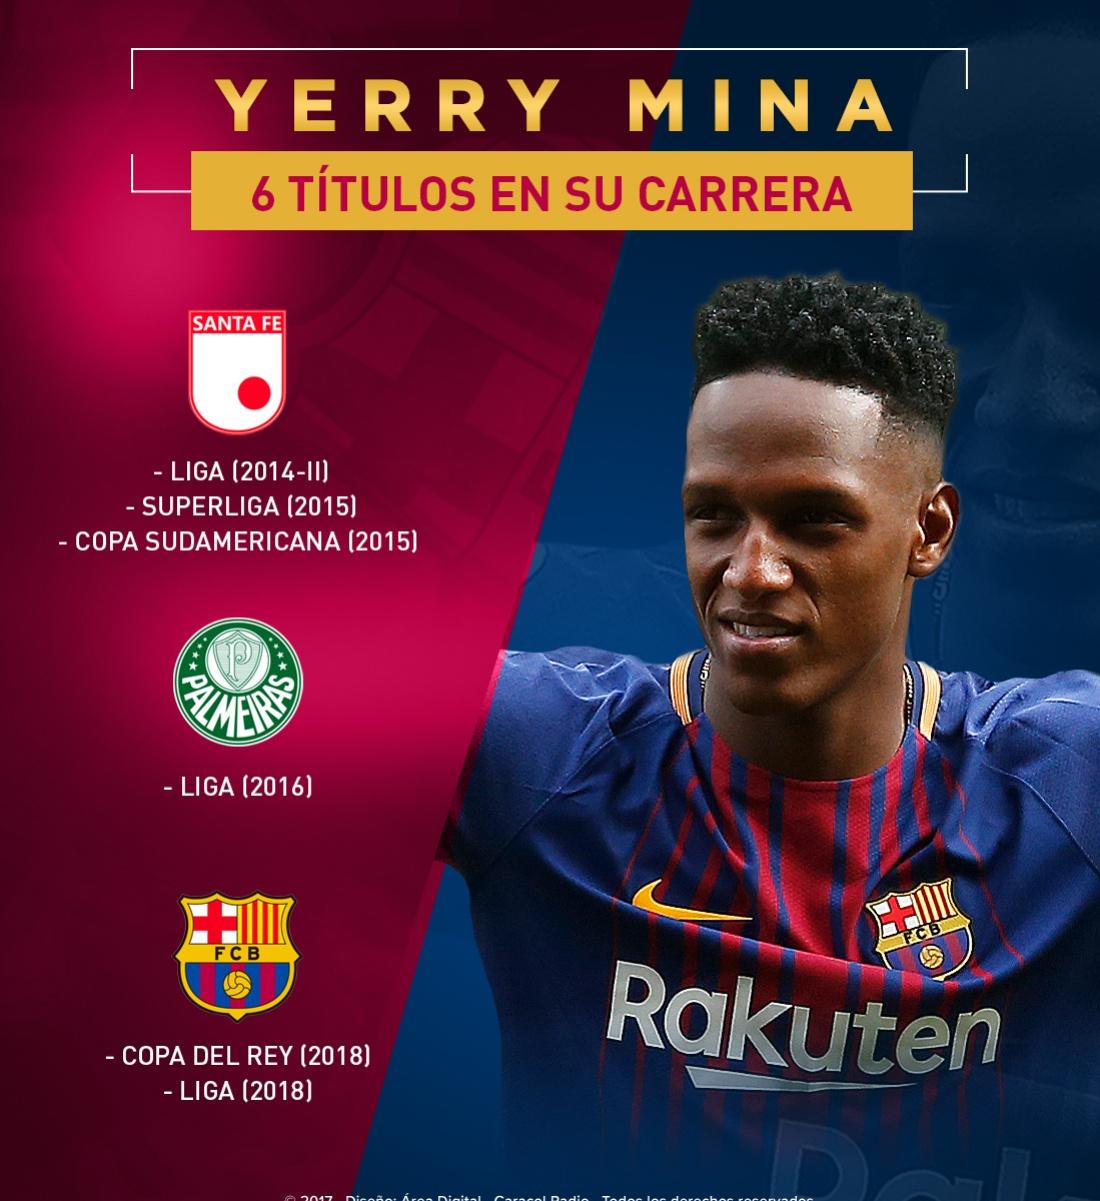 Yerry Mina Barcelona: Yerry Mina se corona campeón con Barcelona y llega a 6 títulos